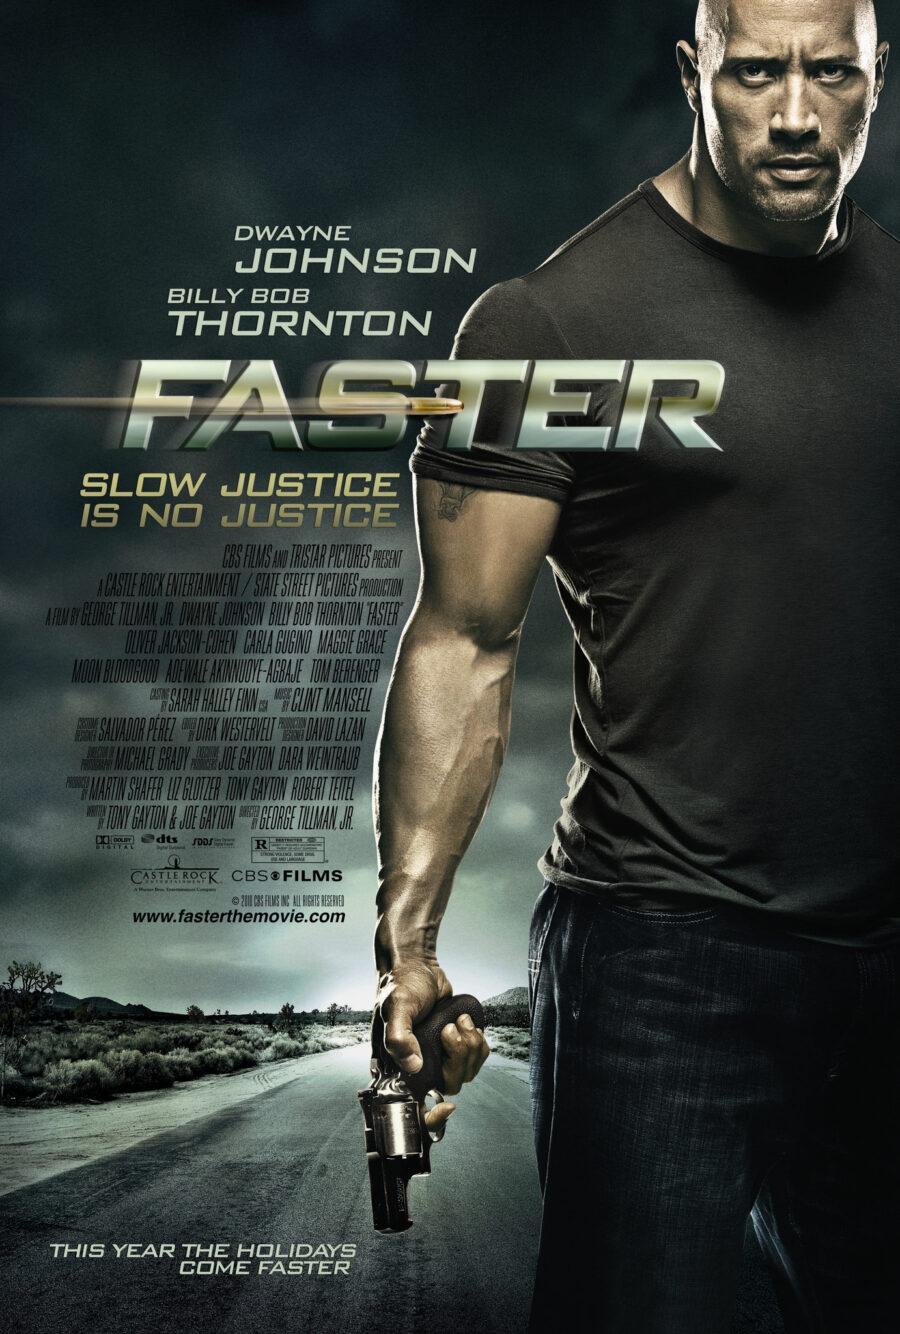 dwayne johnson faster poster